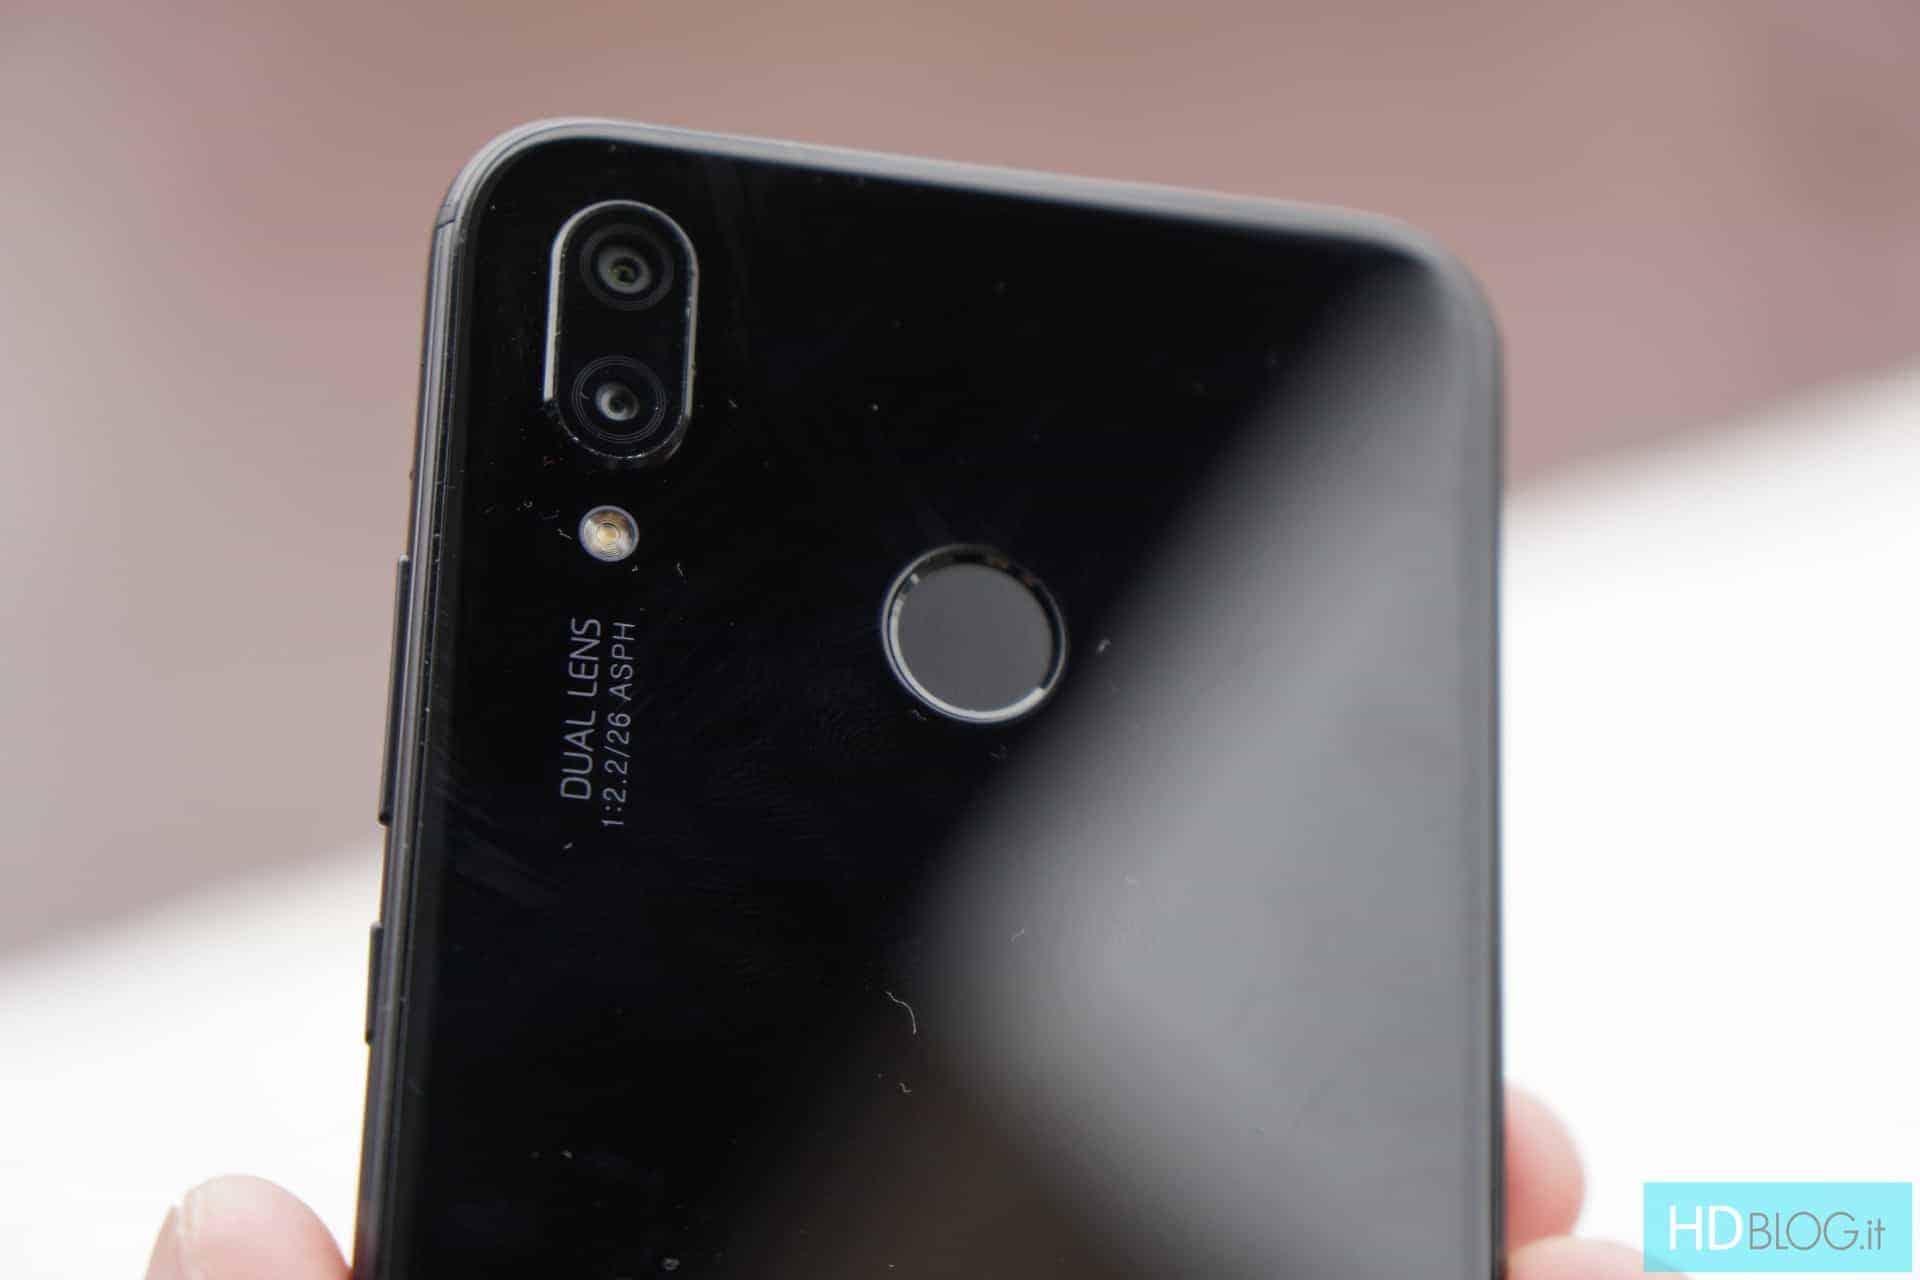 Huawei P20 Lite HDBlog image prelaunch 22